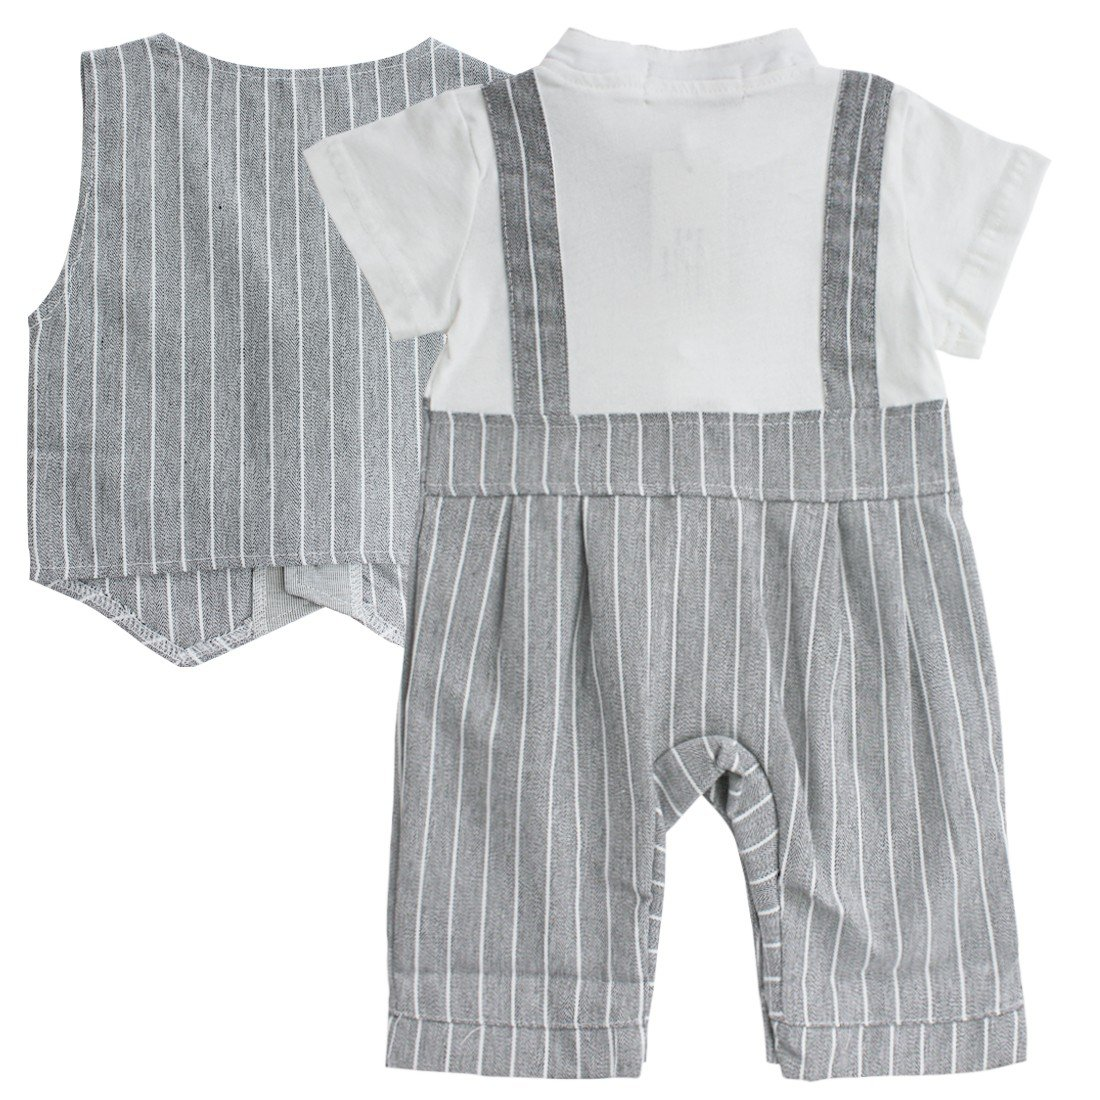 Iffee Baby Boy Formal Wedding Gentleman Tuxedo Romper+Vest Outfit Toddler Clothes Set